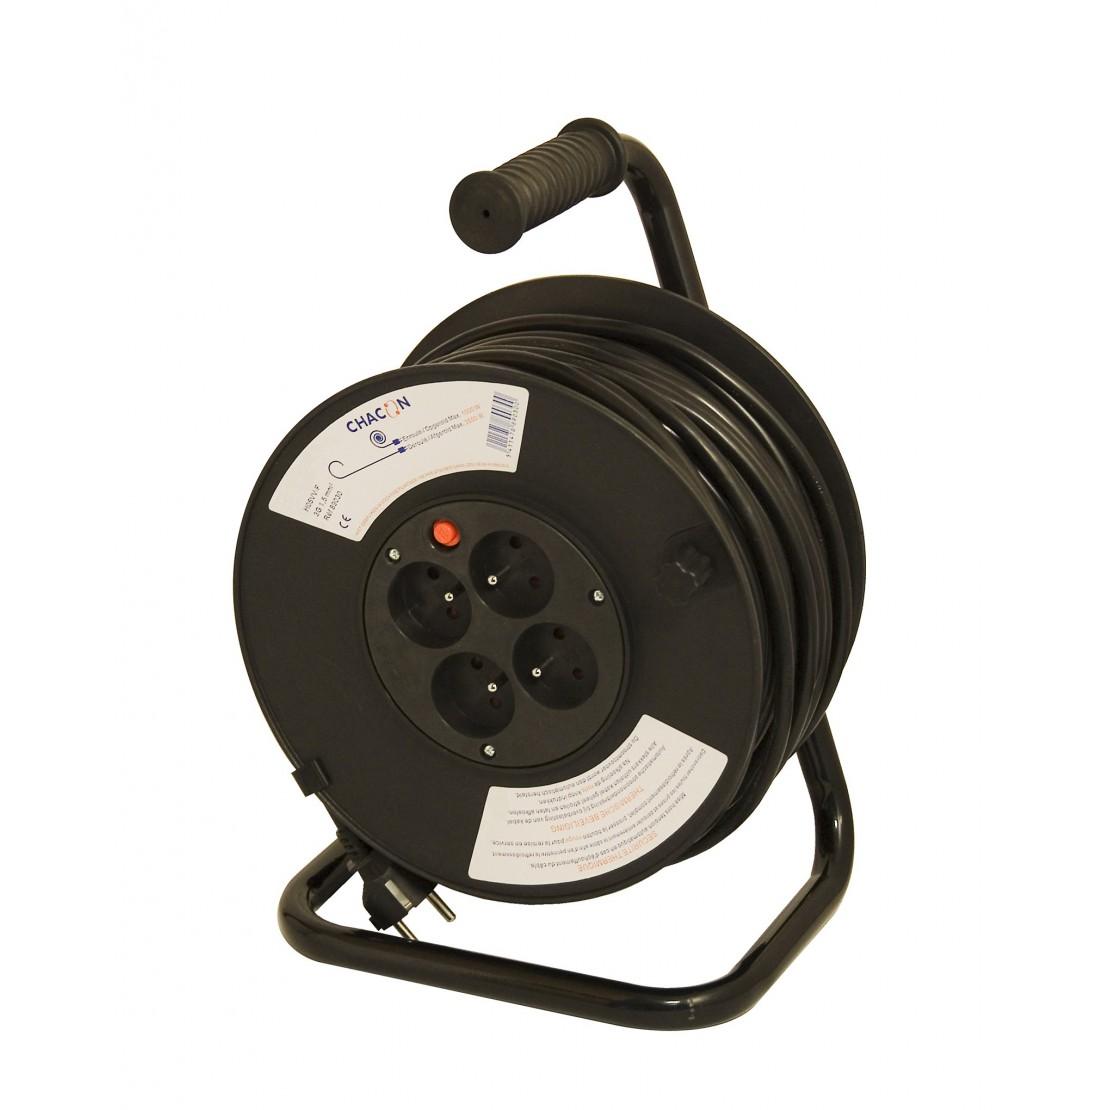 Kabelhaspel 4 x 16A HO5VV-F 3x 1,5mm2- 50 m